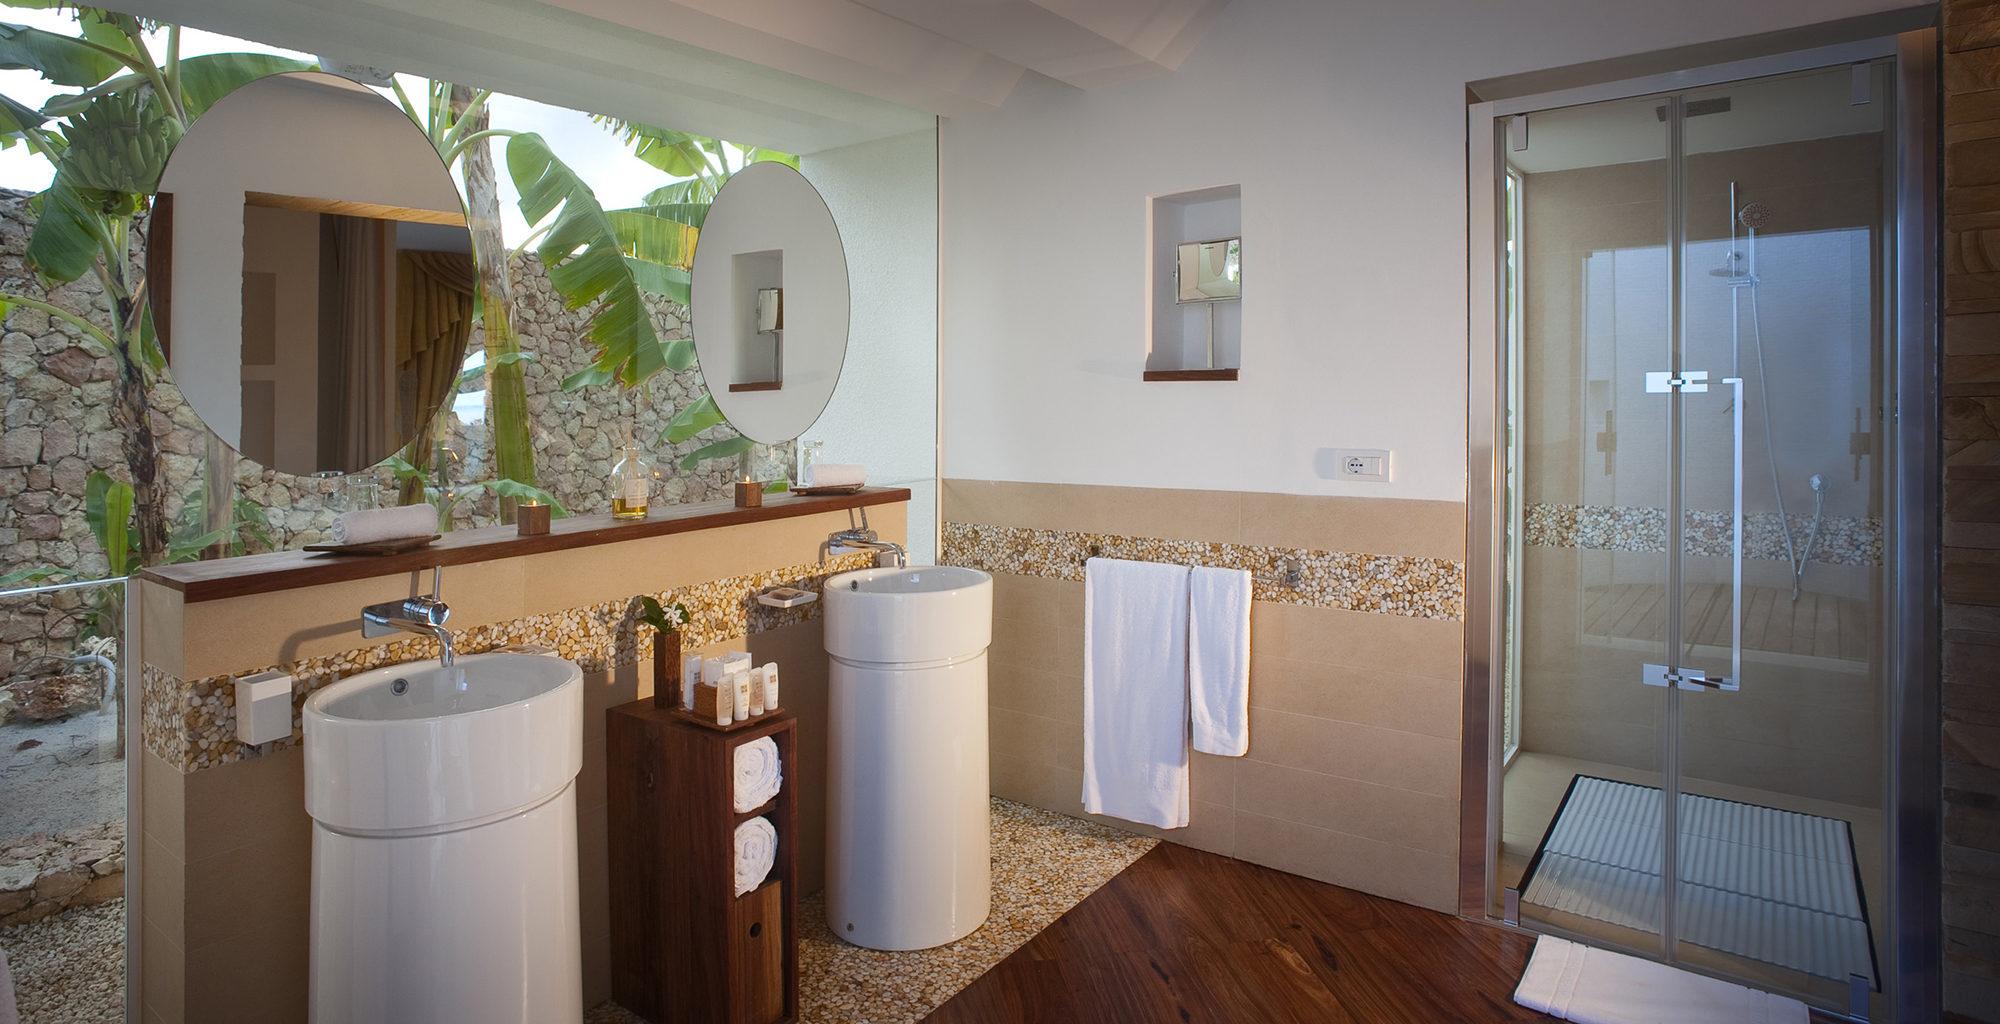 Tanzania-Star-of-the-East-Bathroom